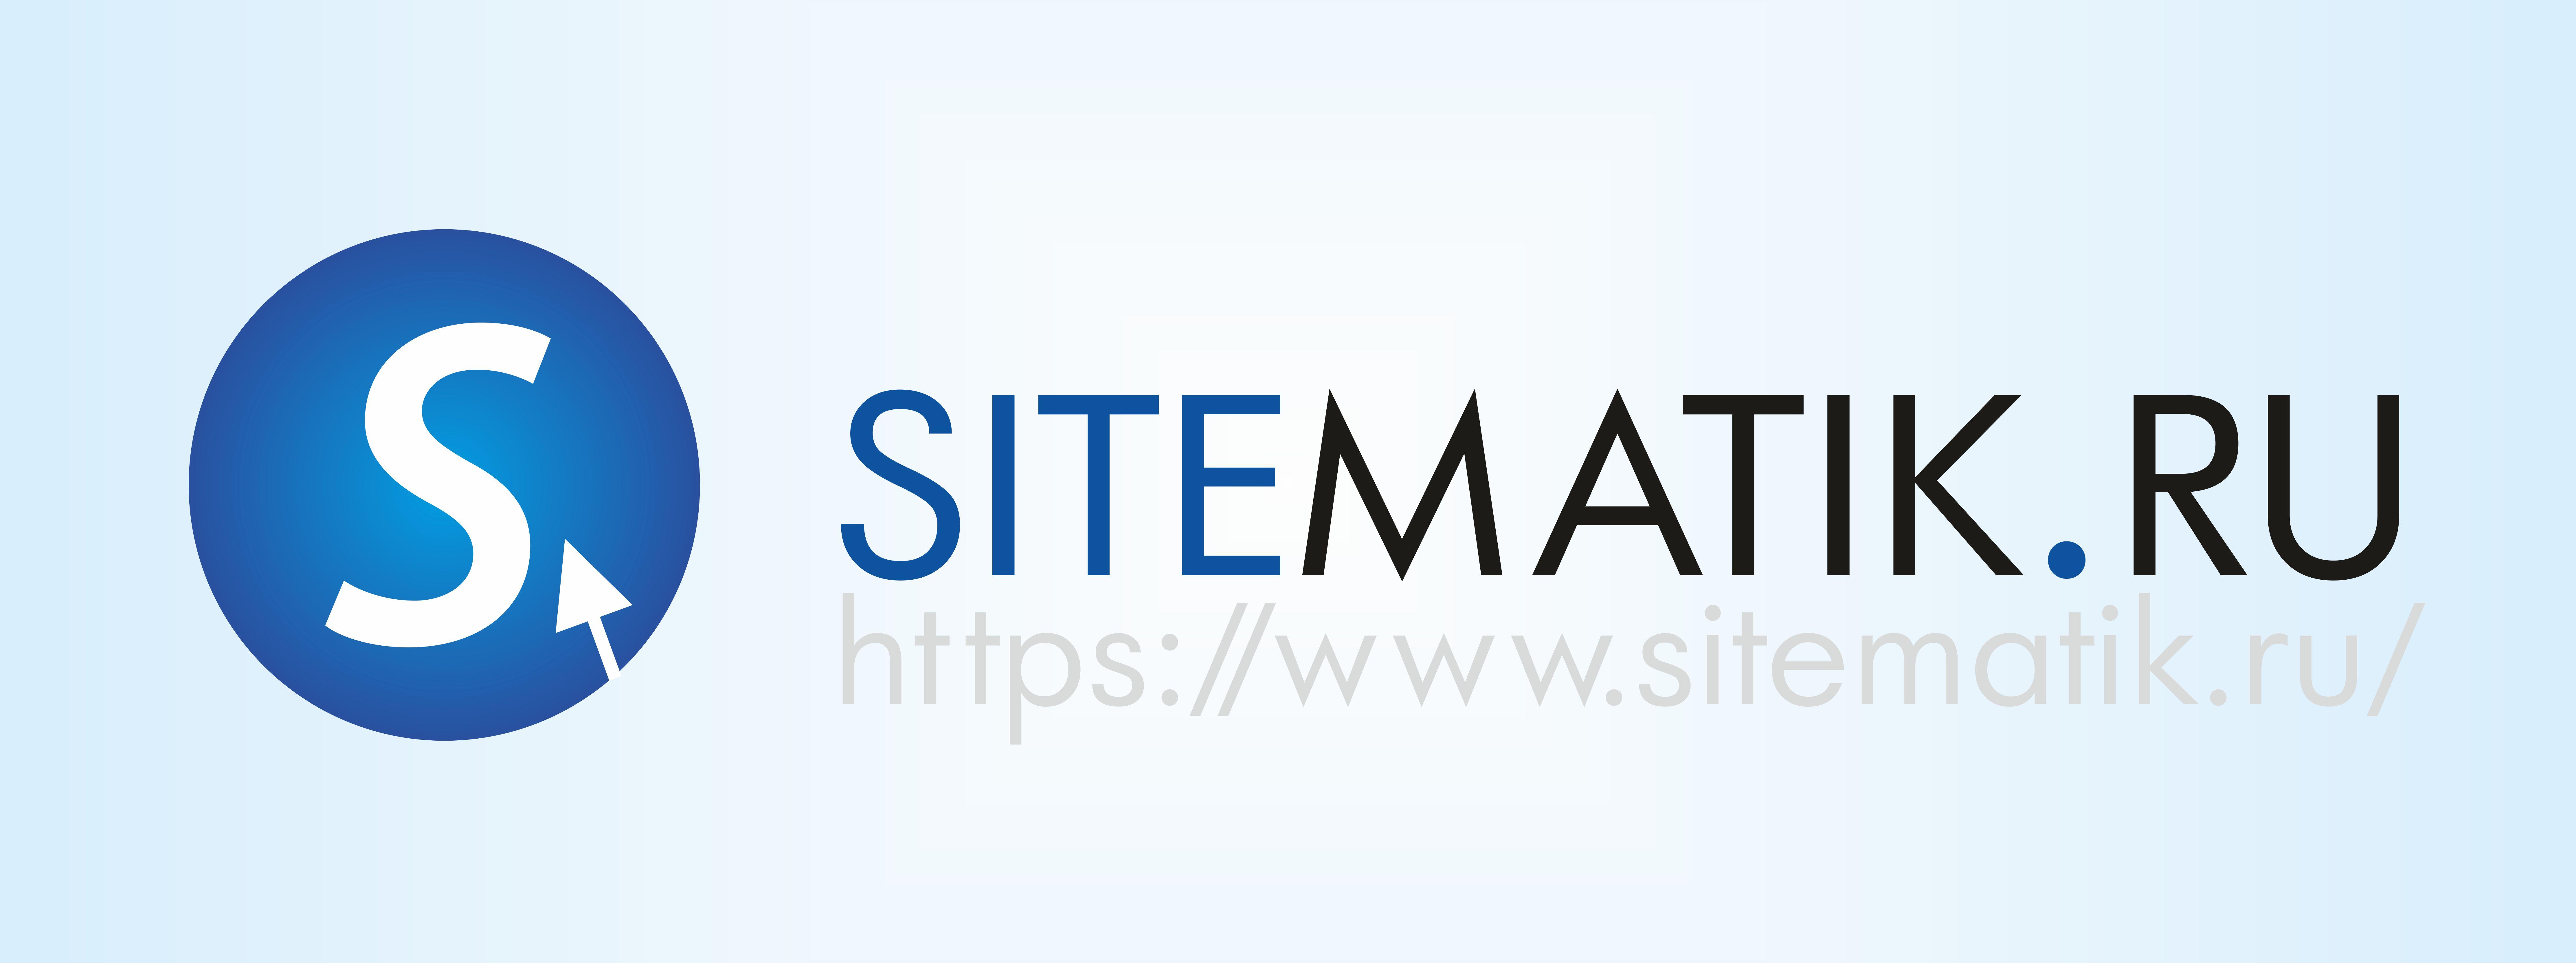 Логотип для Веб-студии - дизайнер ilikedesign